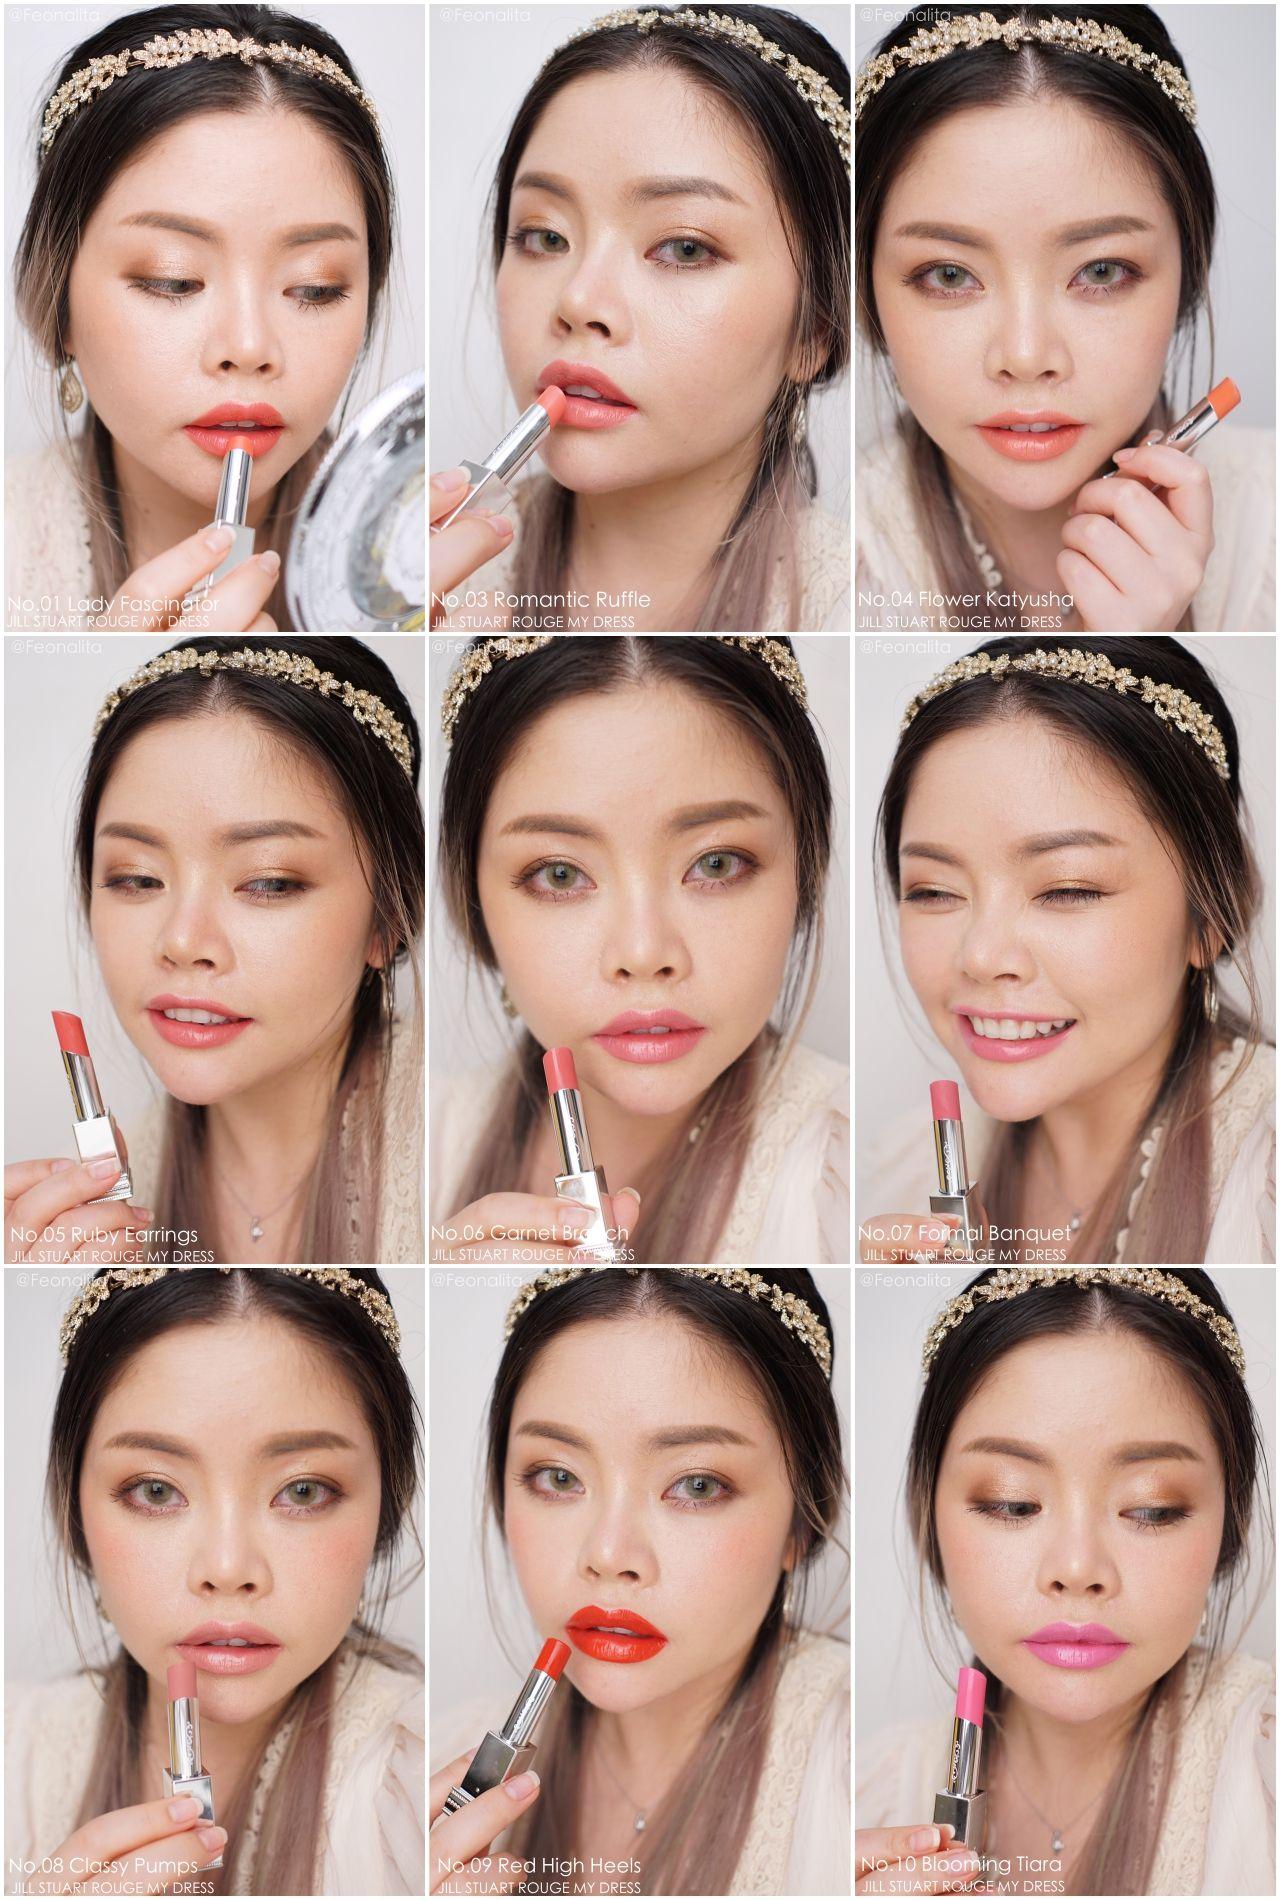 Jill Stuart Rouge My Dress Asian Makeup Pinterest Lipstick Beauty Lip Matte 04 Rosy Blush Swatches Color Make Up